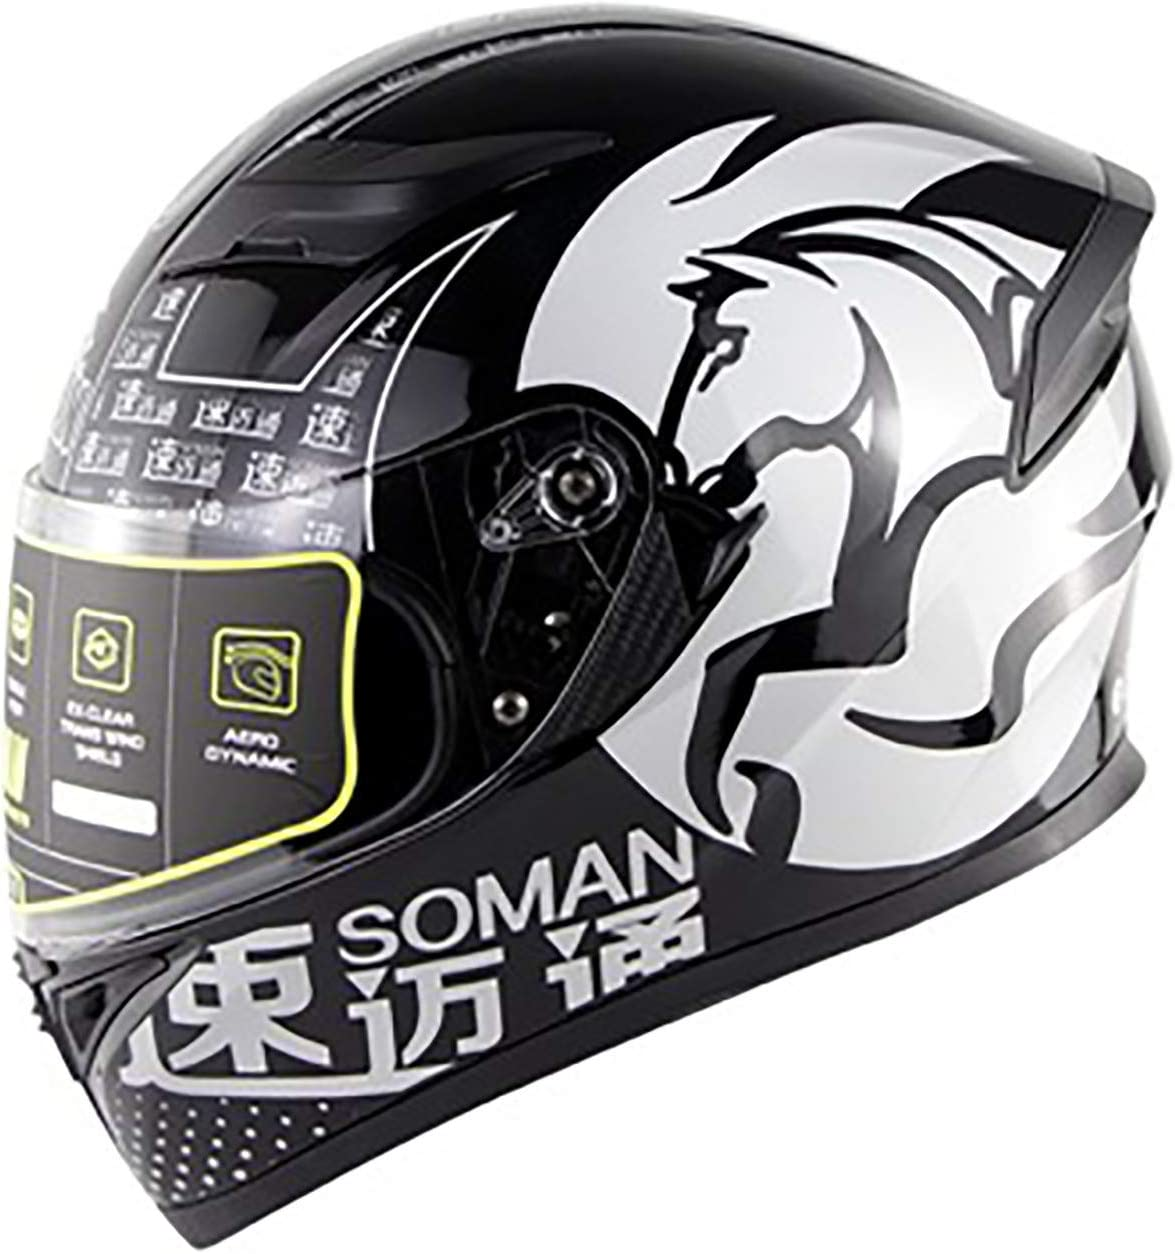 Full Dedication Face Motorcycle Helmet DOT Str ECE Approved Popularity Motorbike Moped